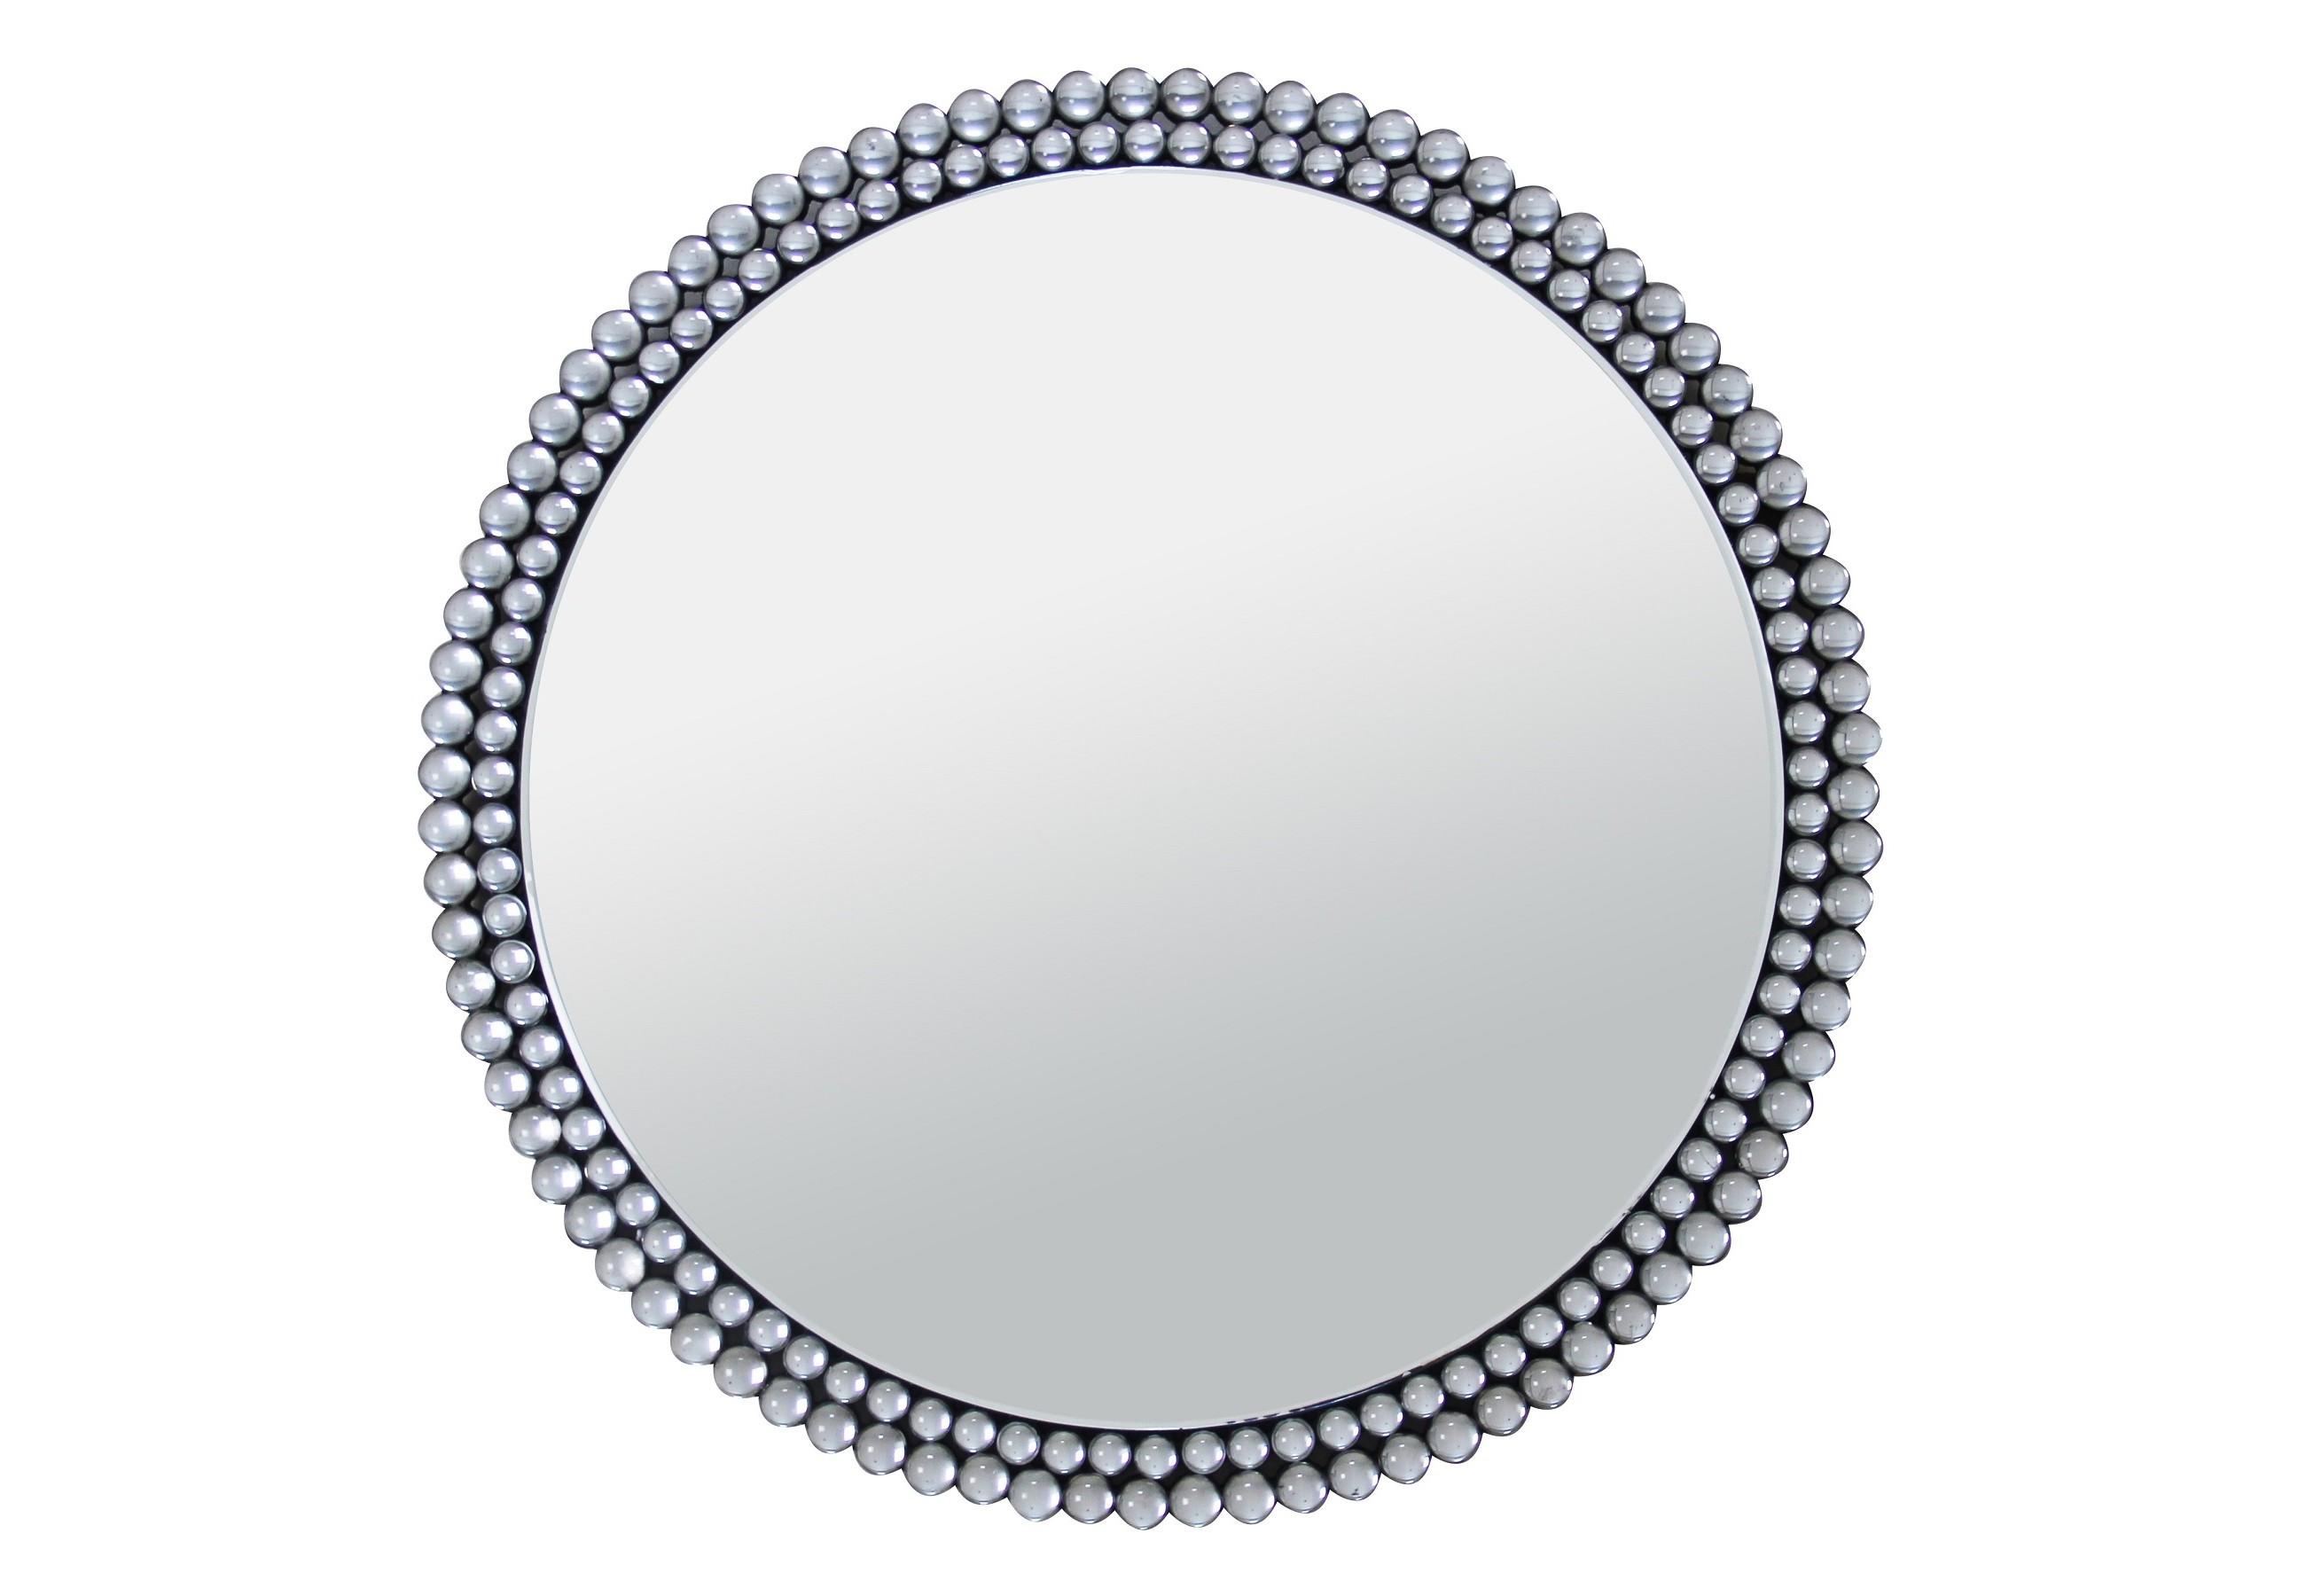 Зеркало SpecchioНастенные зеркала<br><br><br>Material: МДФ<br>Ширина см: 80<br>Высота см: 80<br>Глубина см: 2